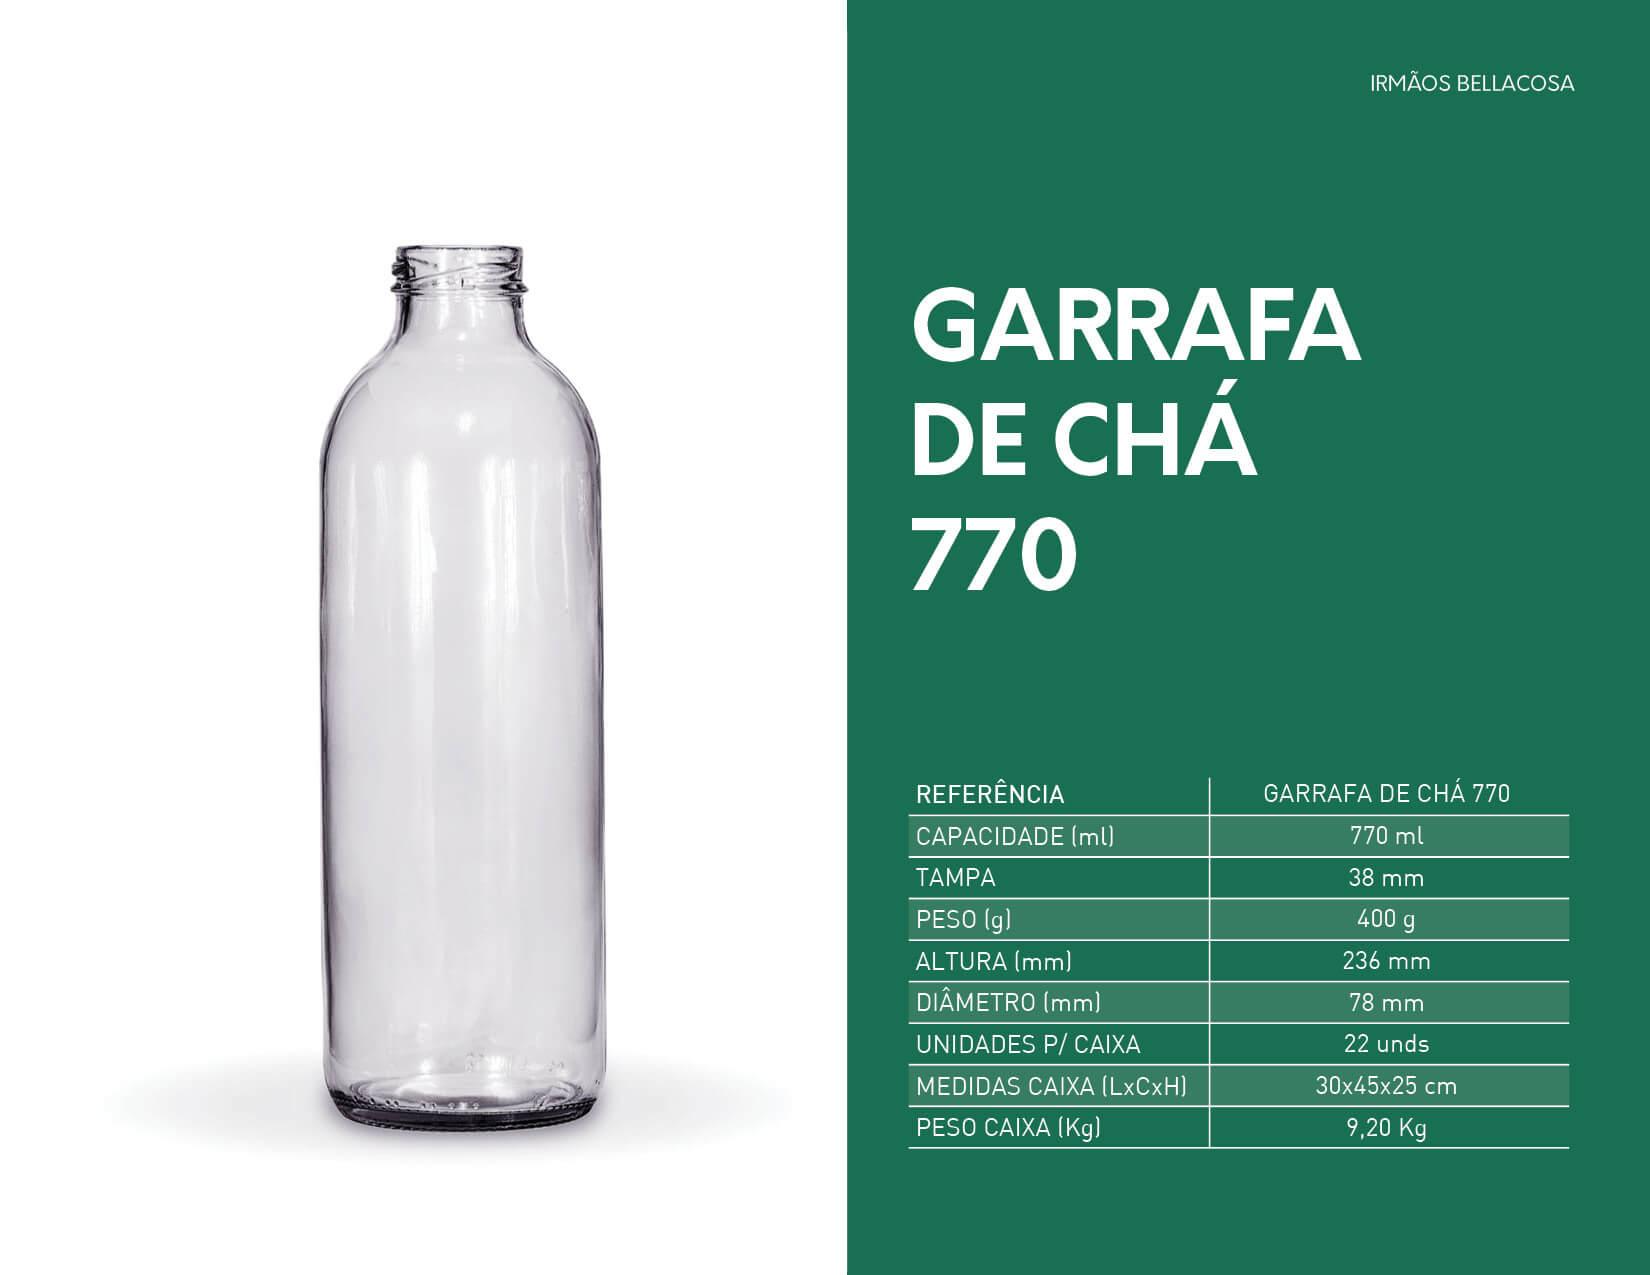 044-Garrafa-de-cha-770-irmaos-bellacosa-embalagens-de-vidro